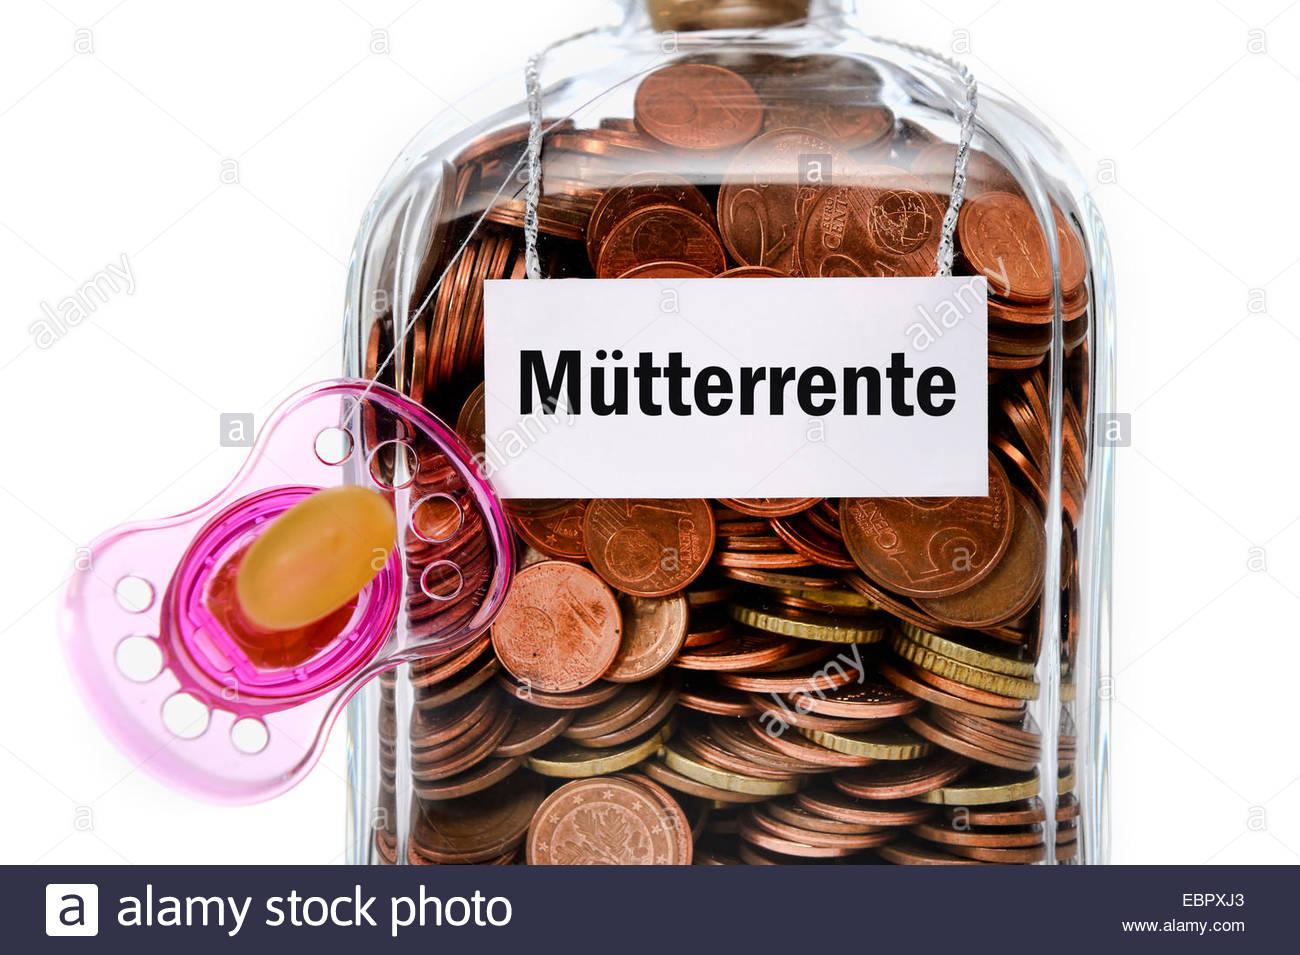 pension payment as appreciation for child management, Muetterrente, Bundesrepublik Deutschland - Stock Image